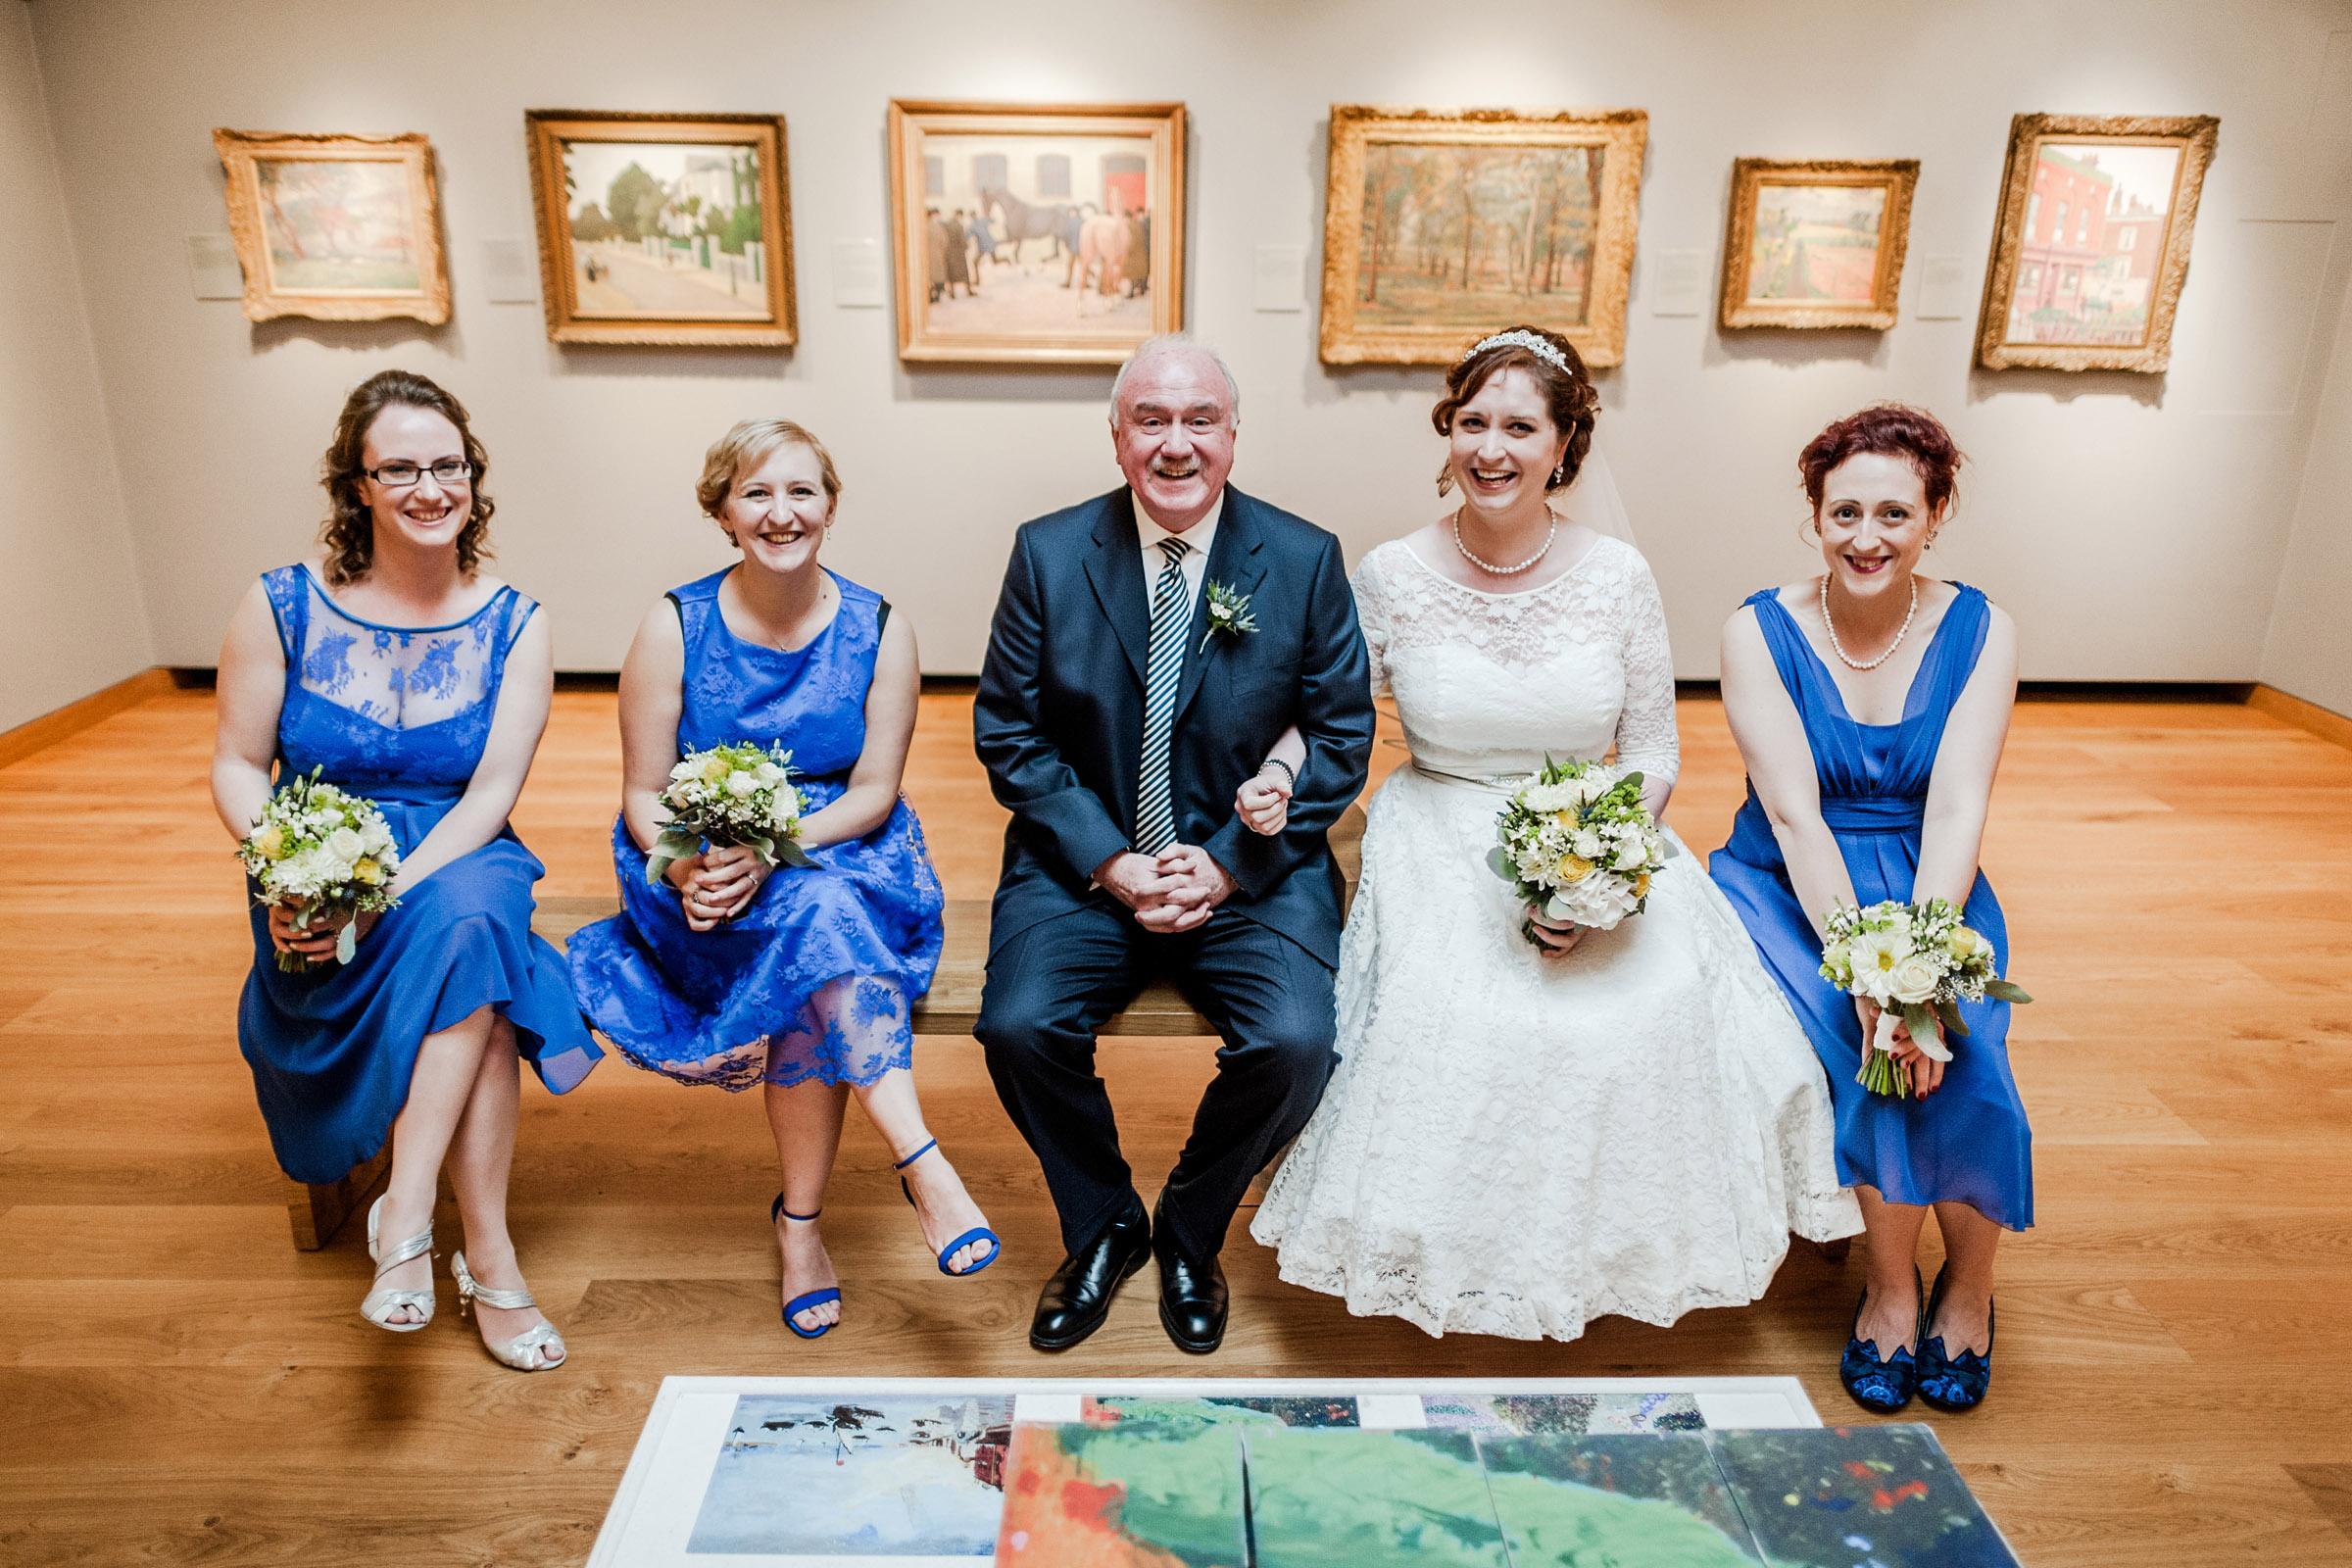 Ashmolean-Museum-Wedding-Pictures-0024.jpg